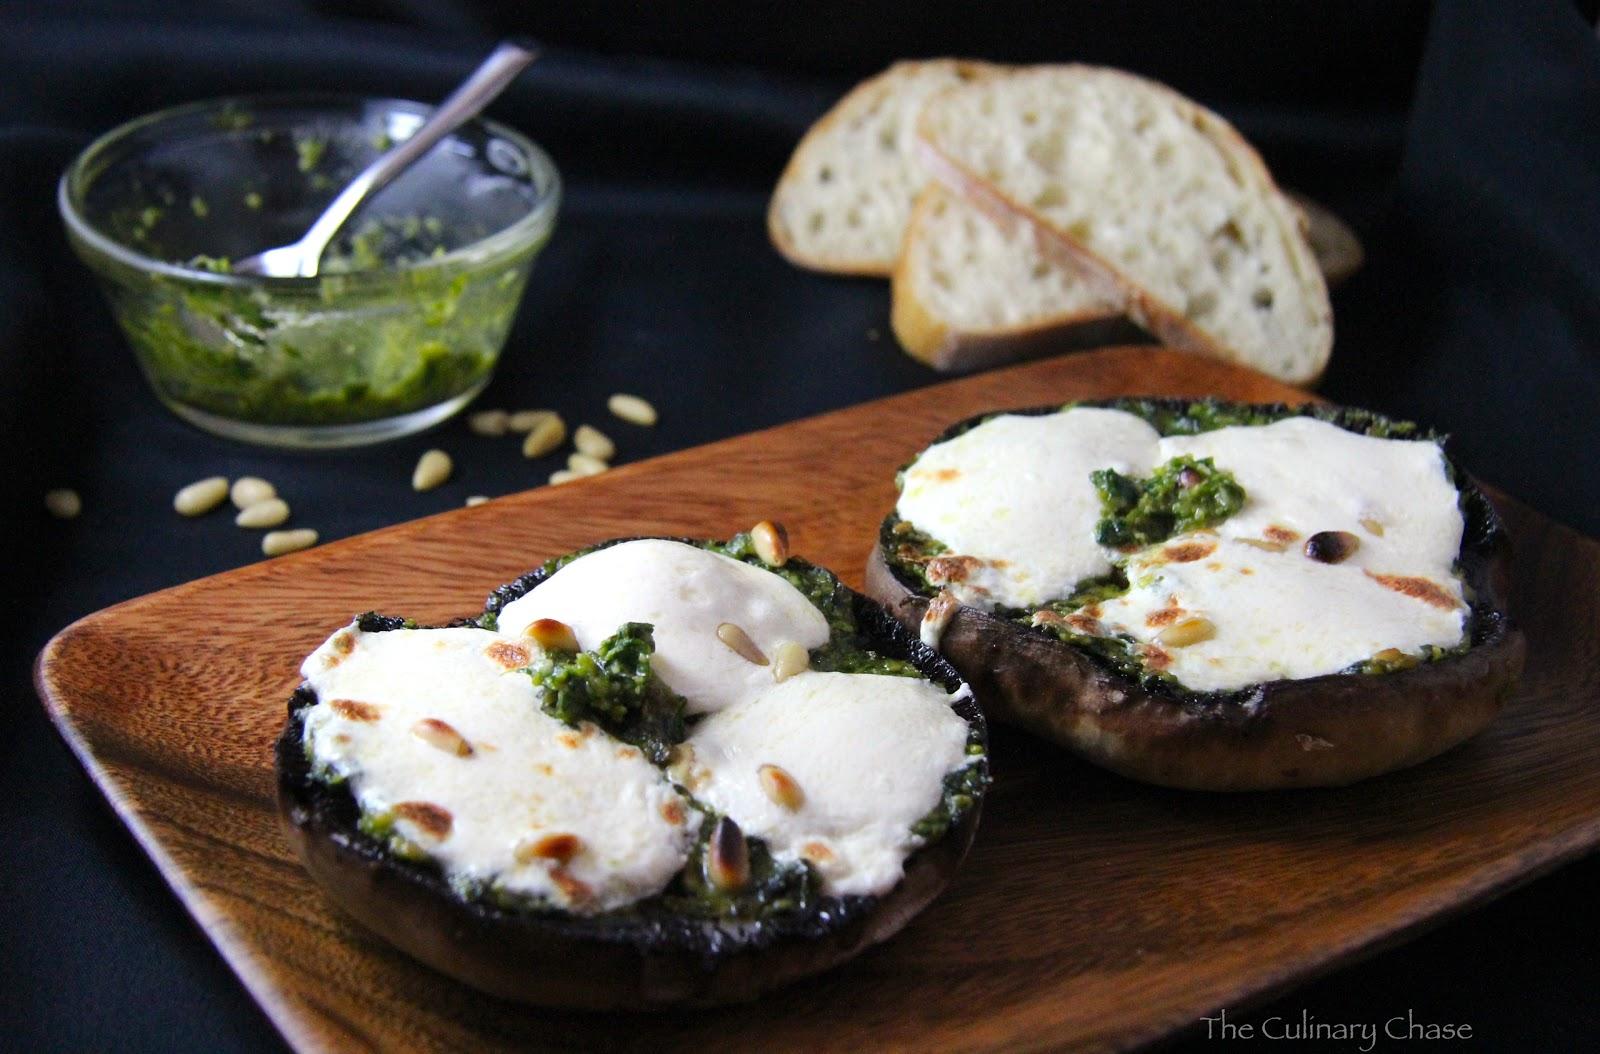 how to choose portobello mushrooms